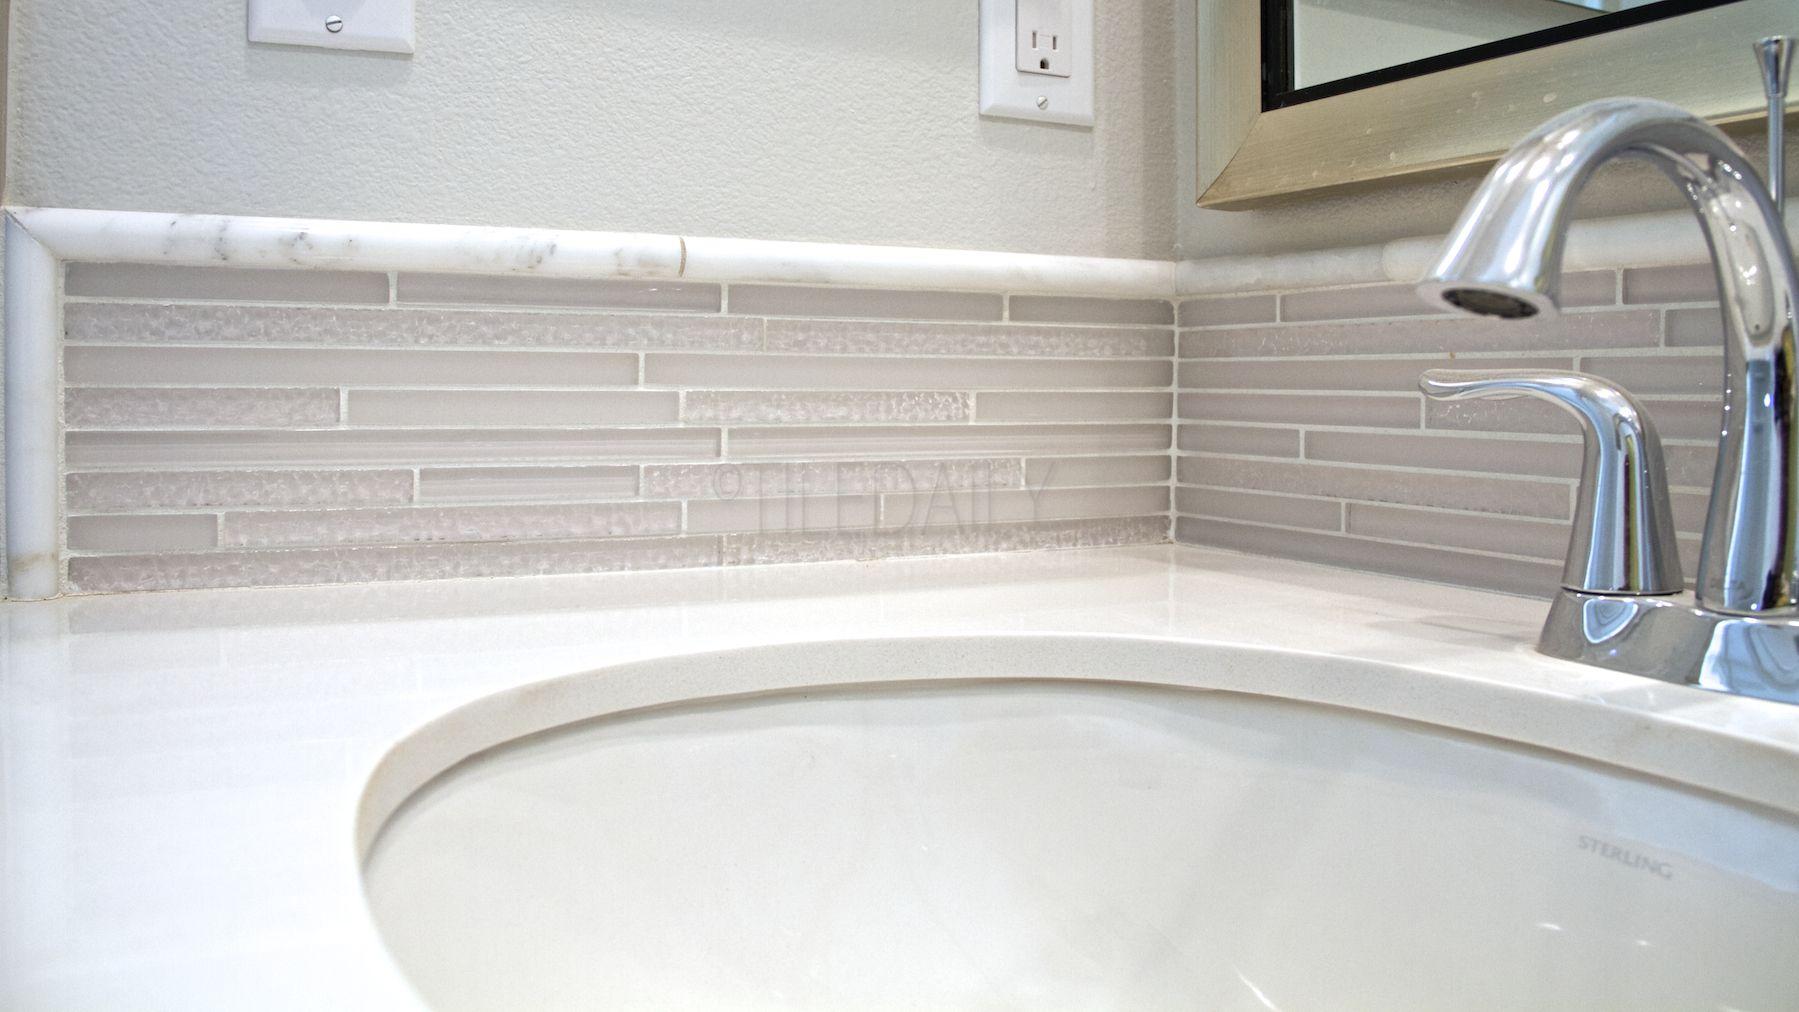 Install Glass Mosaic Tile Backsplash Bathroom Decor Bathroom